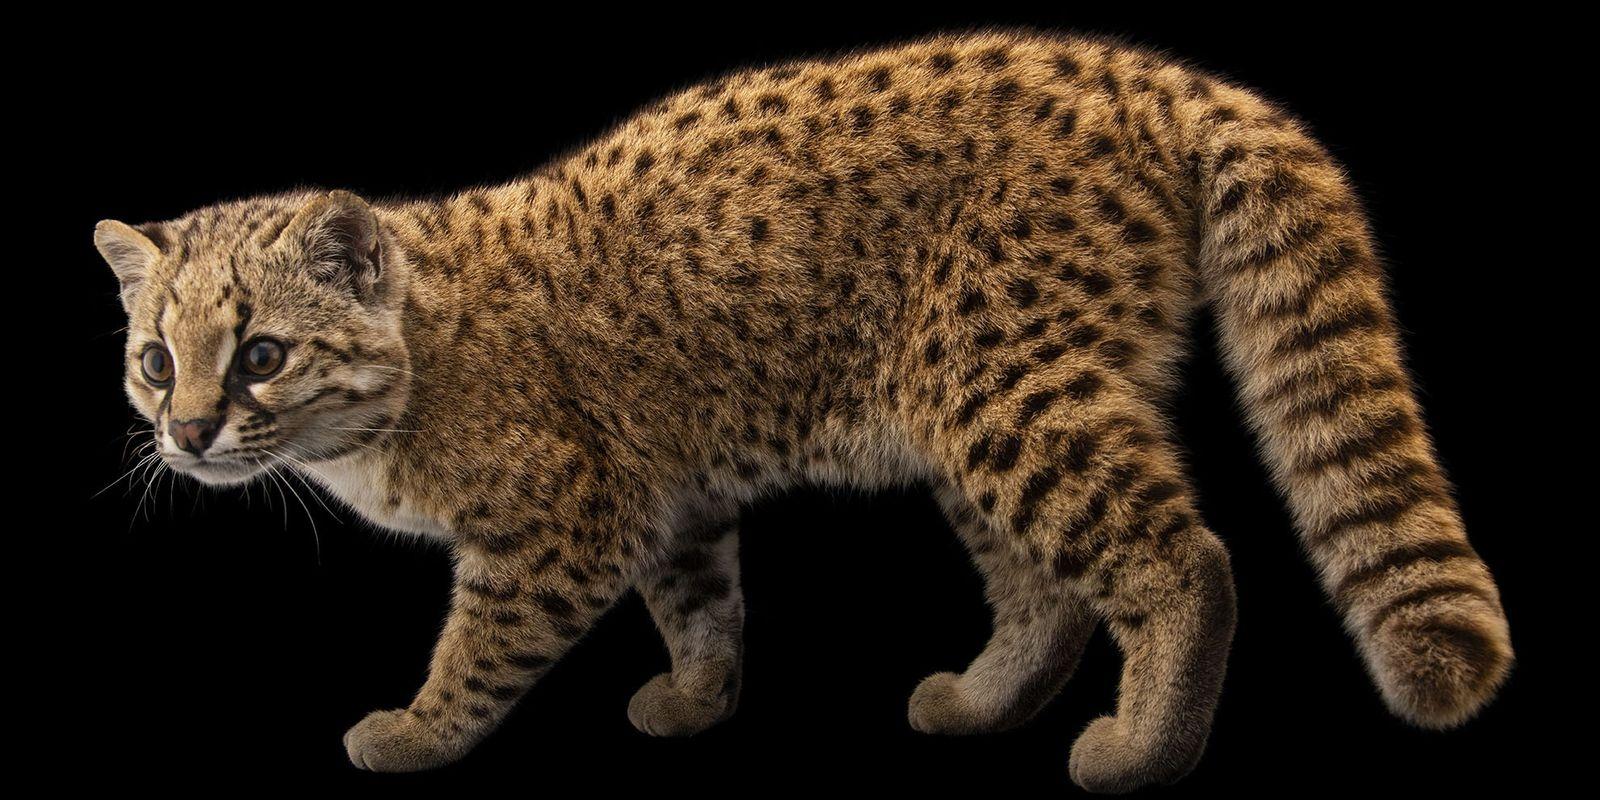 Conoce a la güiña, un 'gato misterioso' en peligro de extinción